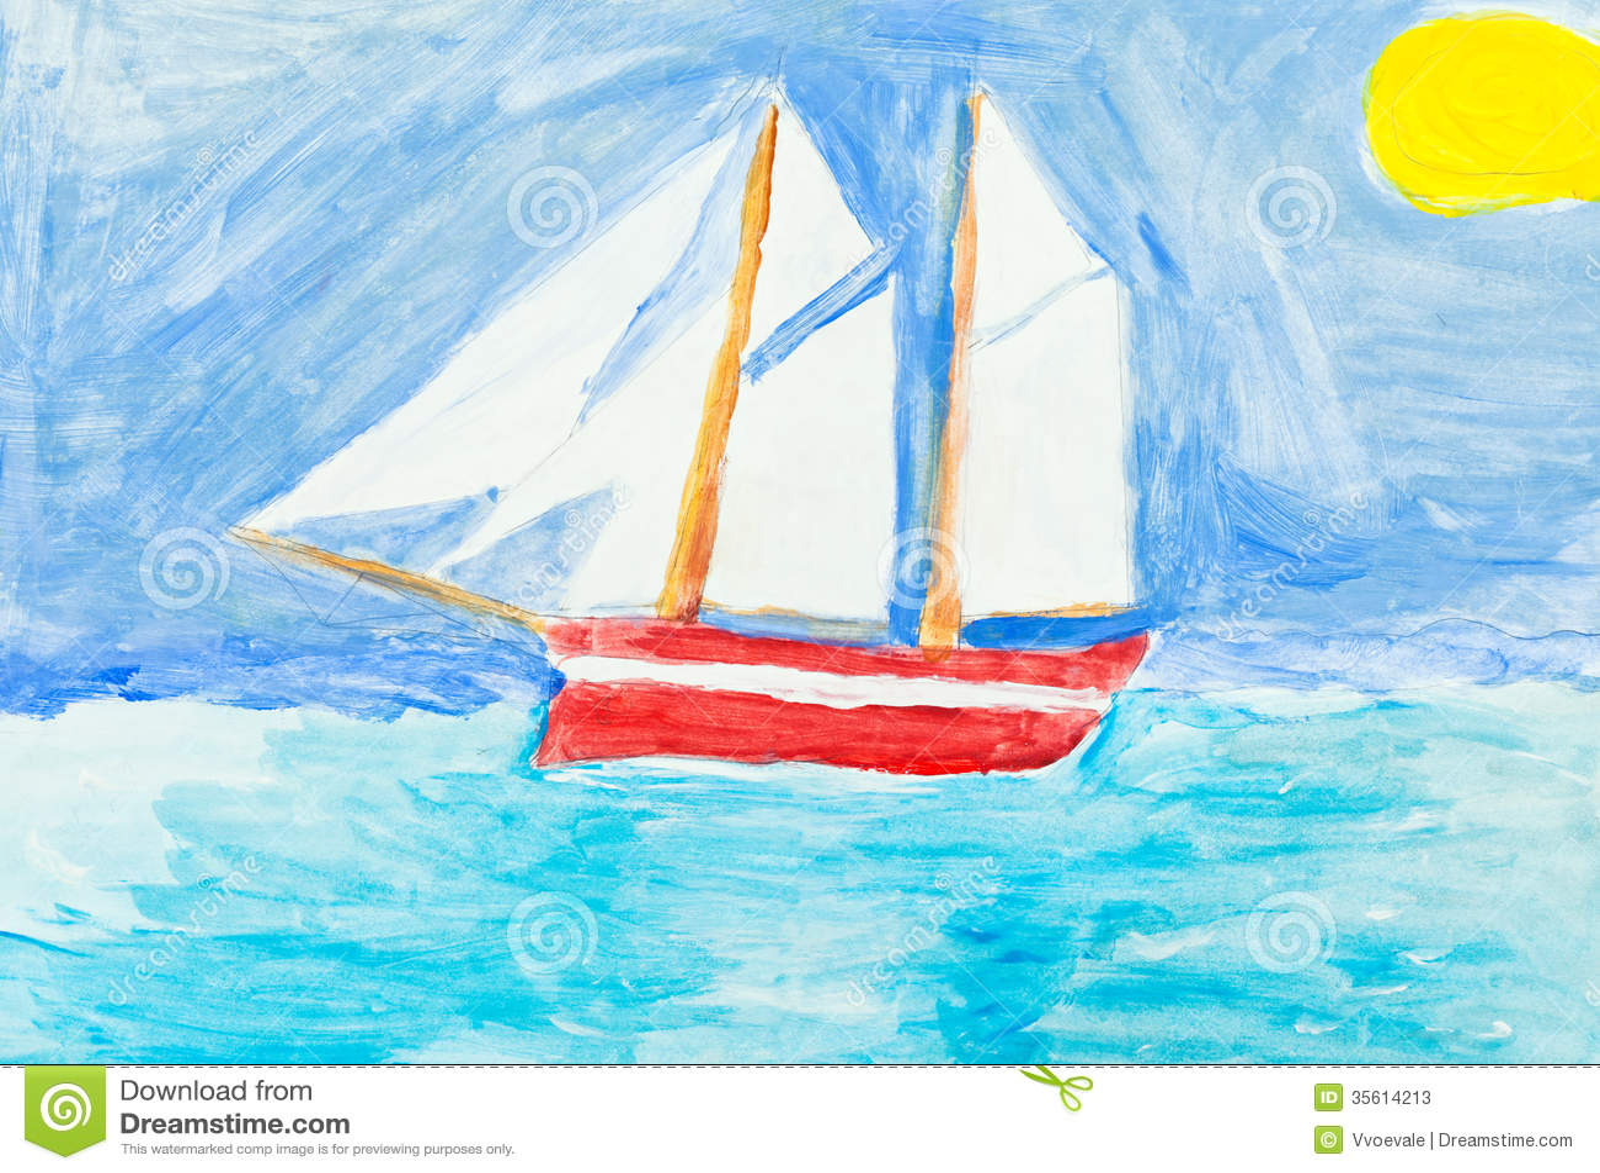 Children Painting - Sailing Vessel In Blue Ocean Stock Photos - Image ...